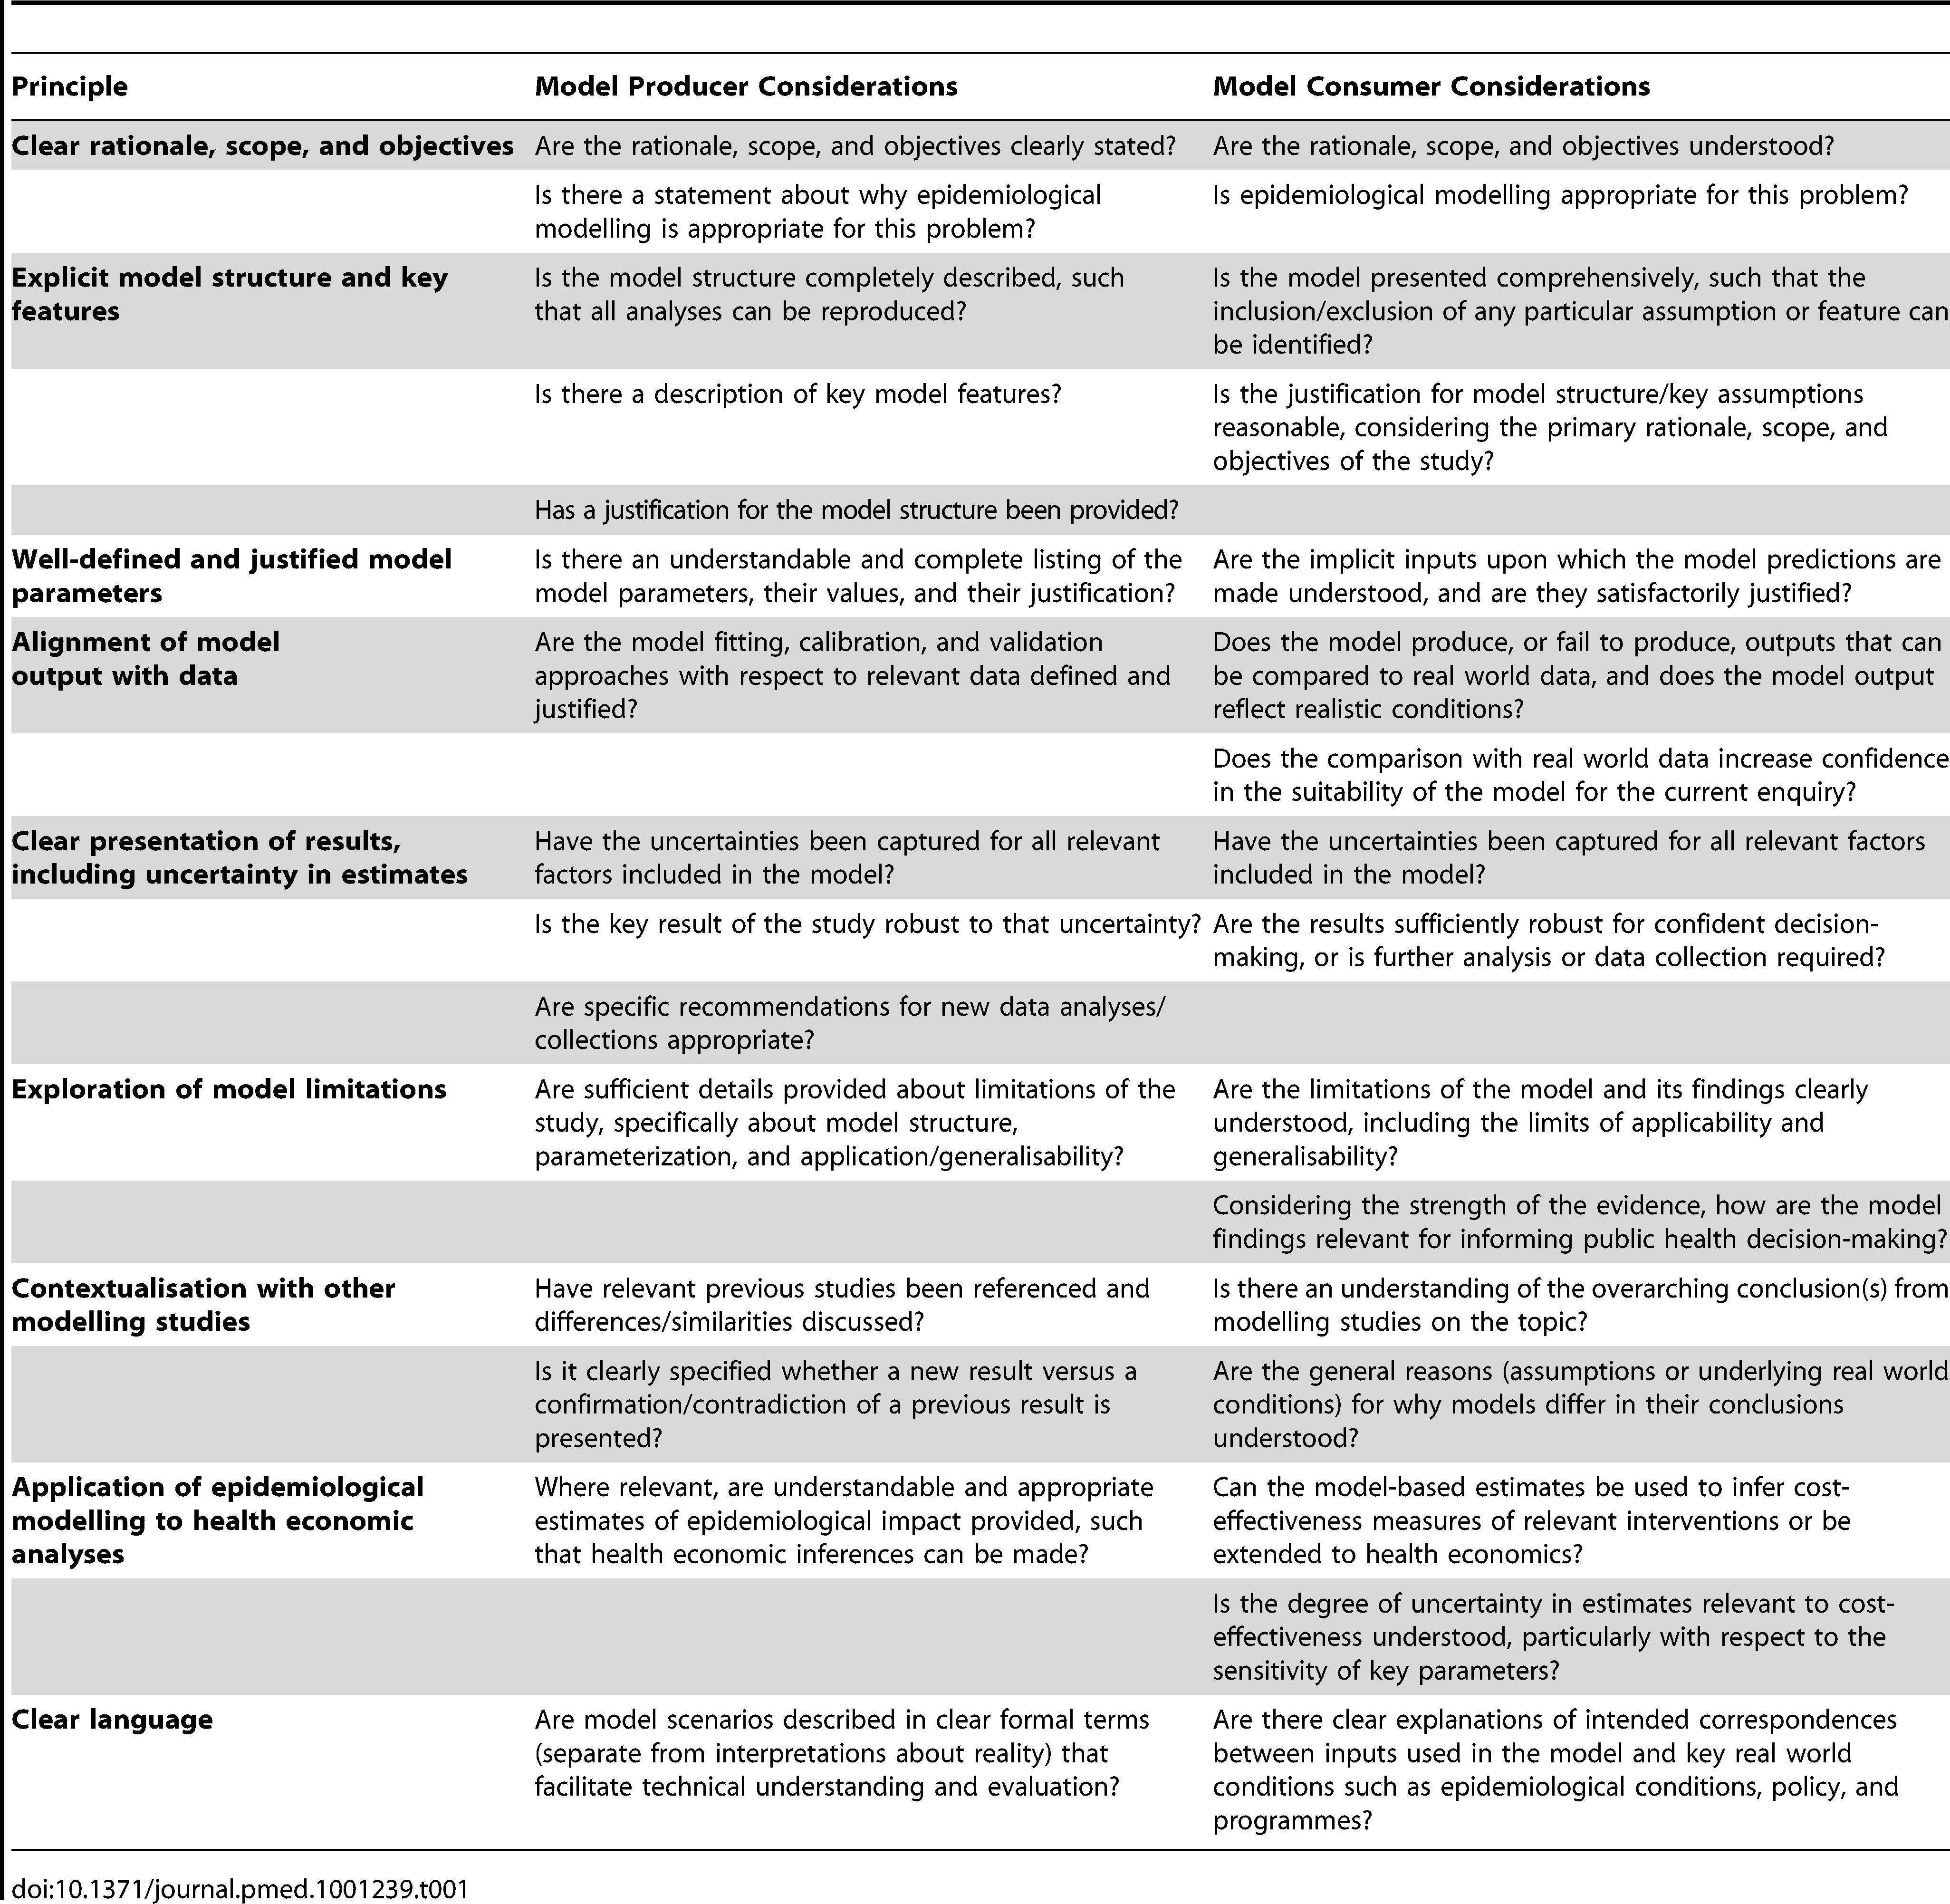 Summary of principles of good HIV epidemiology modelling.